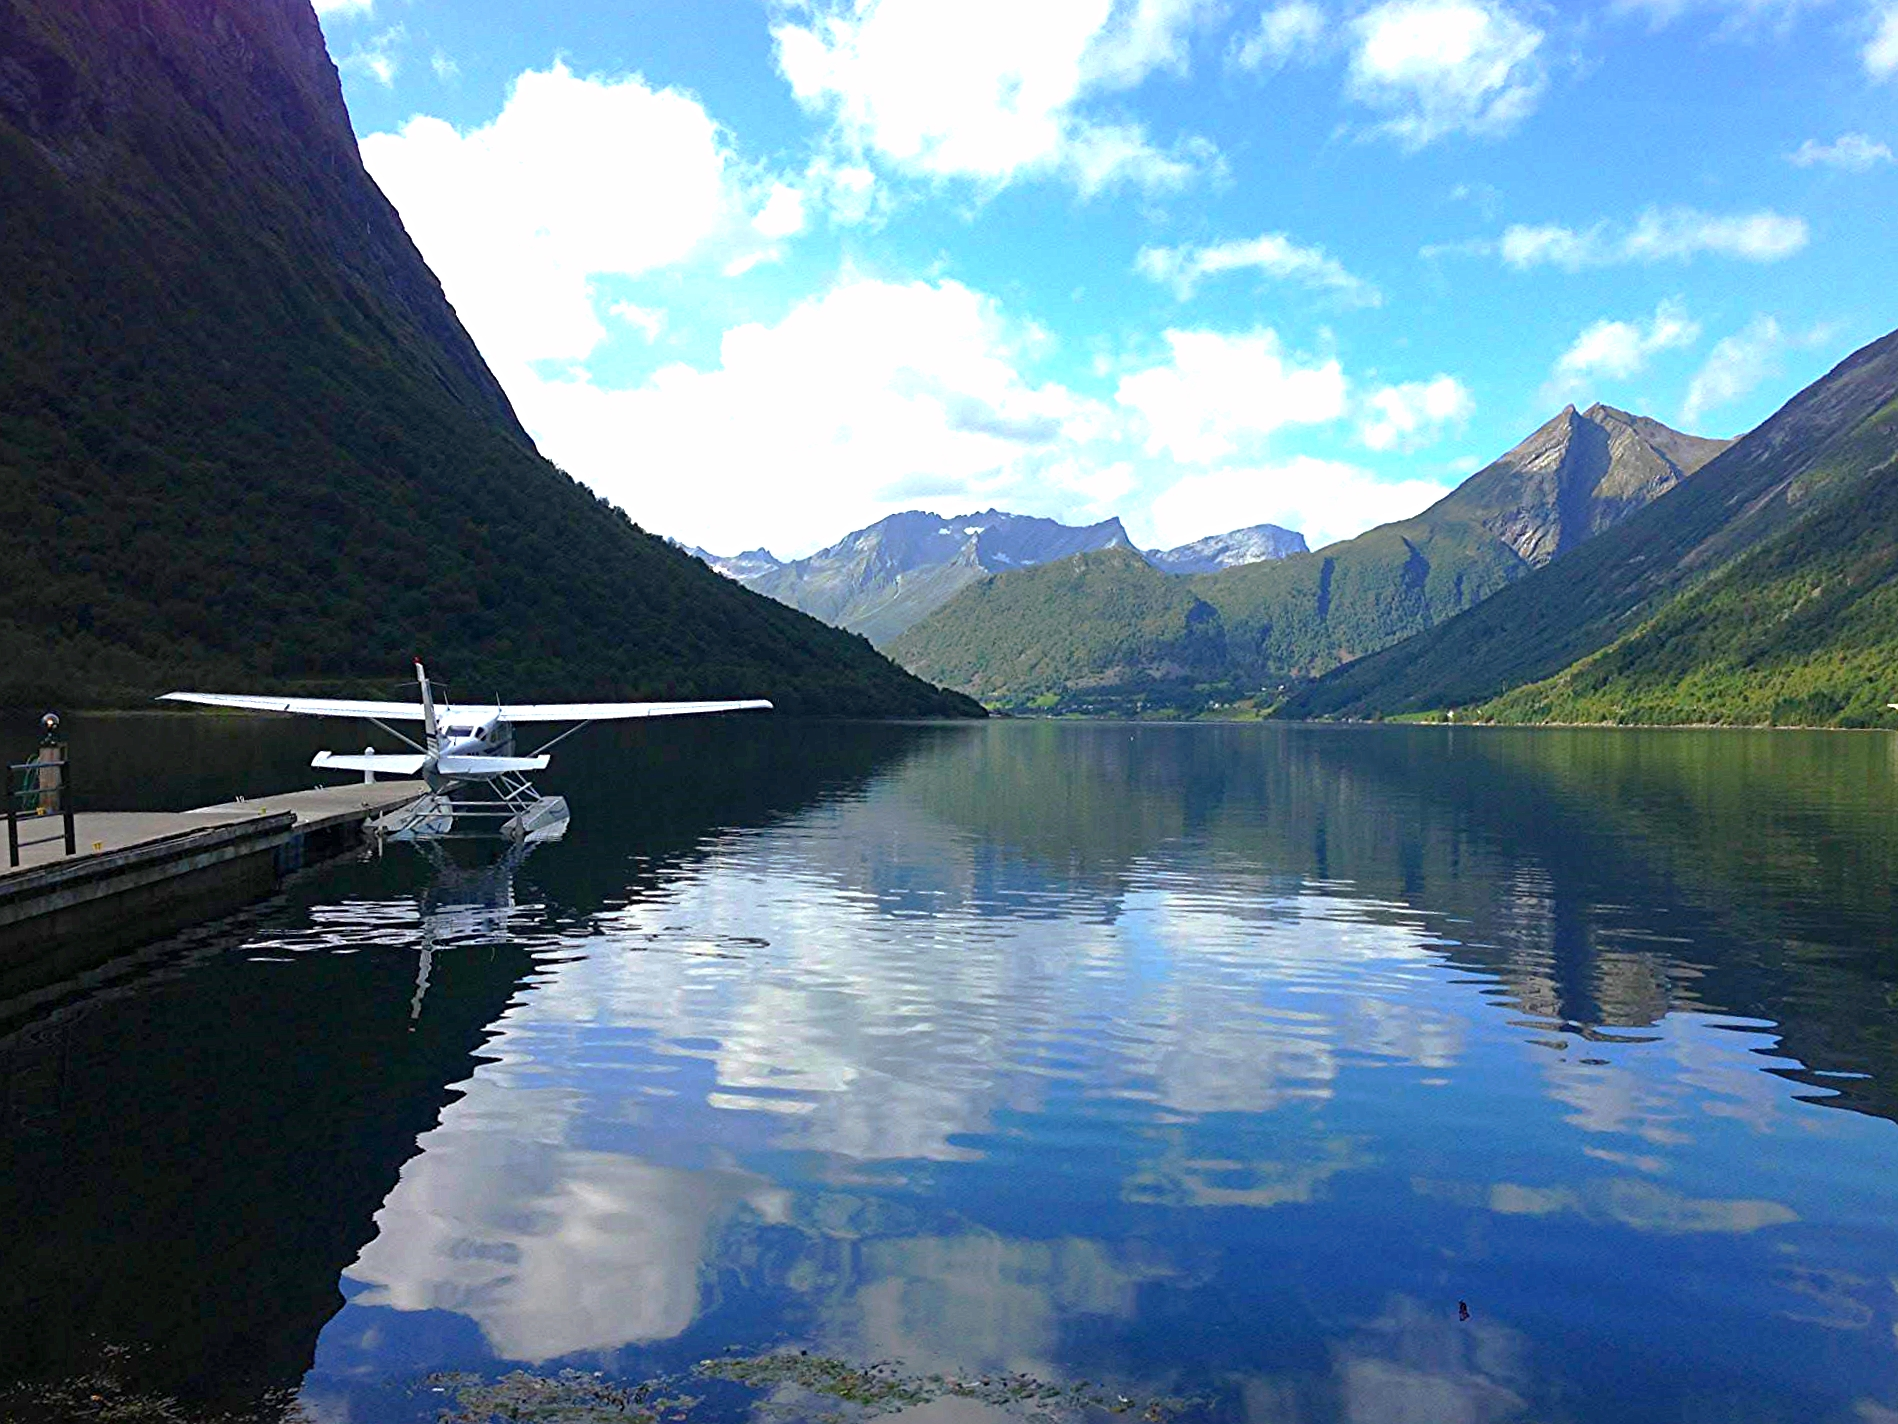 seaplane1.jpg